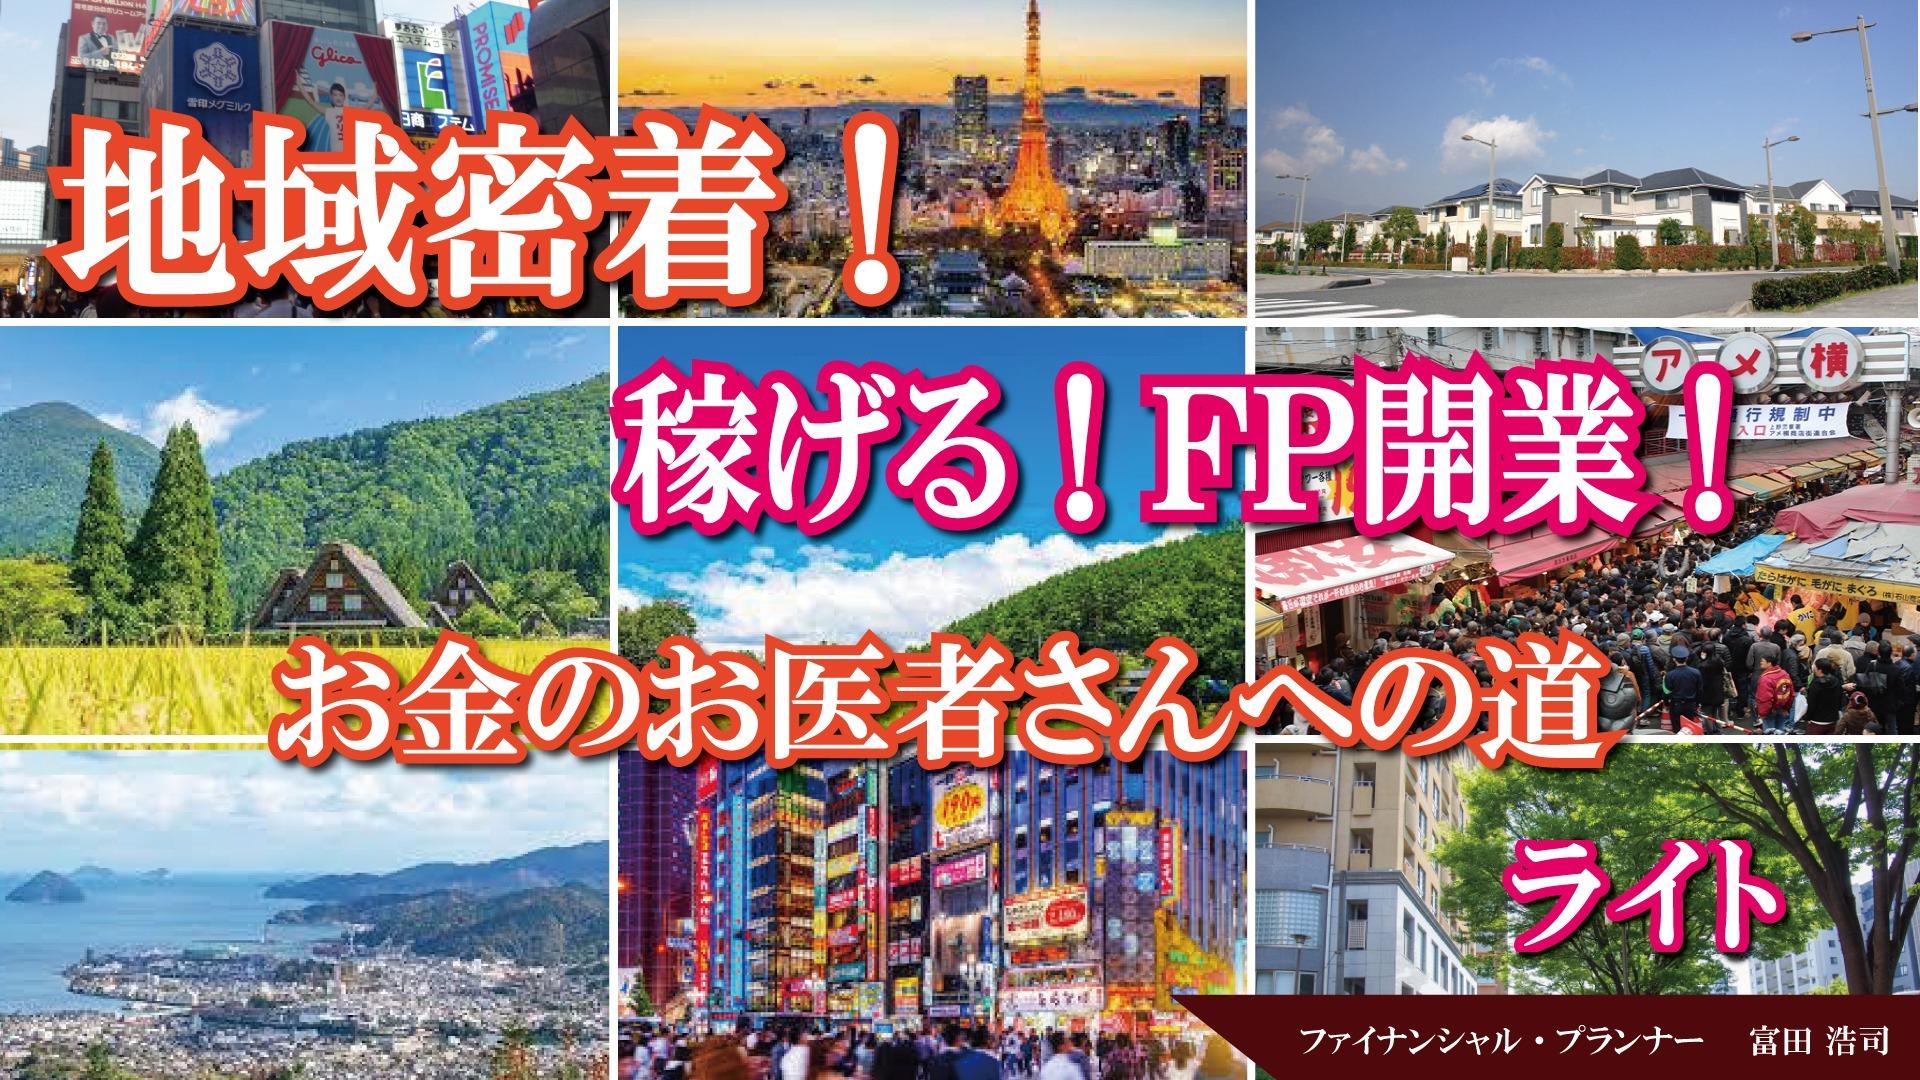 FPサロン オーナー 「ファイナンシャル・プランナー 富田浩司」